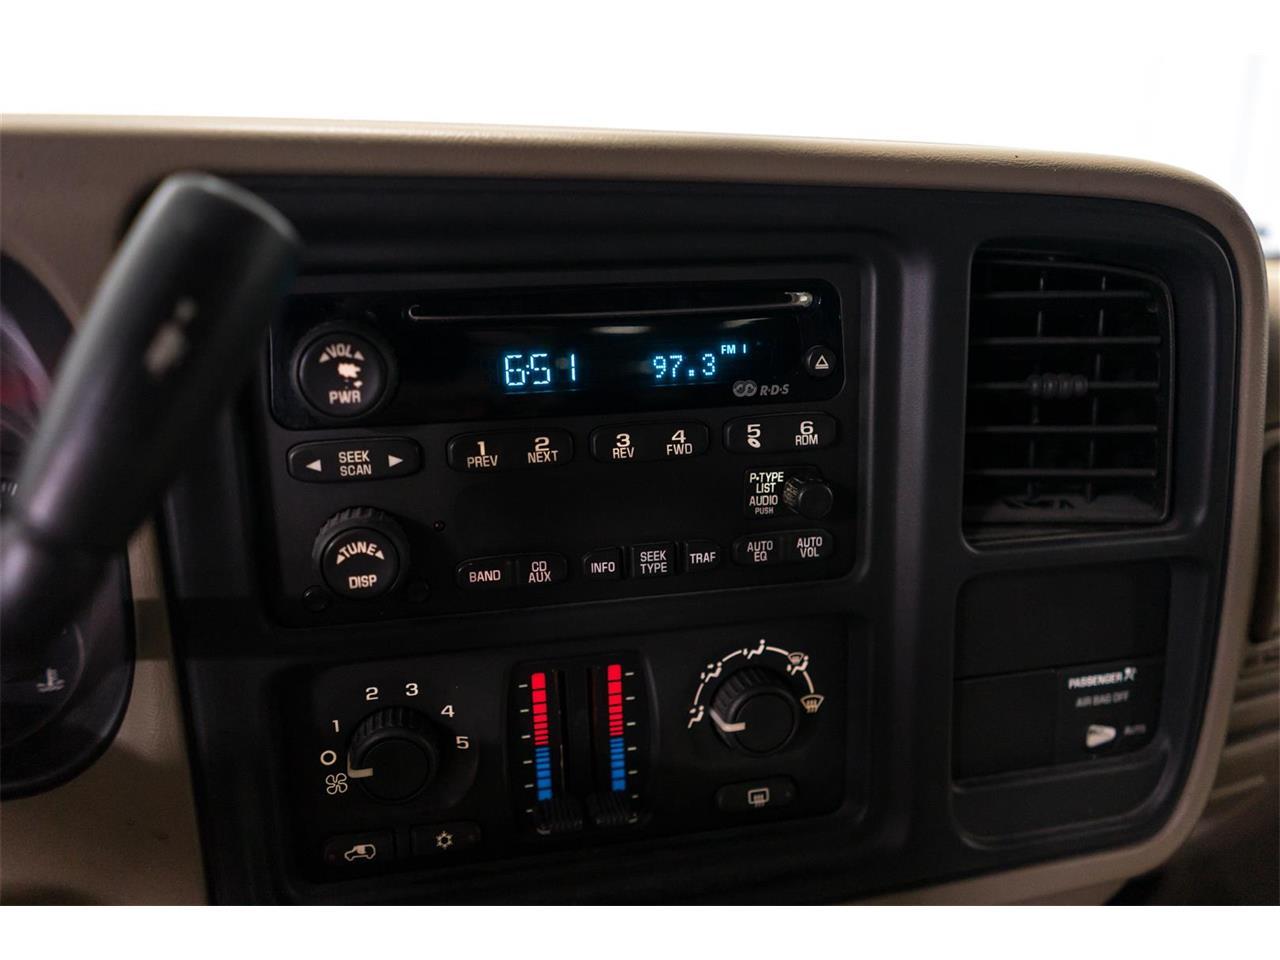 2003 Chevrolet Silverado (CC-1237698) for sale in Chambersburg, Pennsylvania